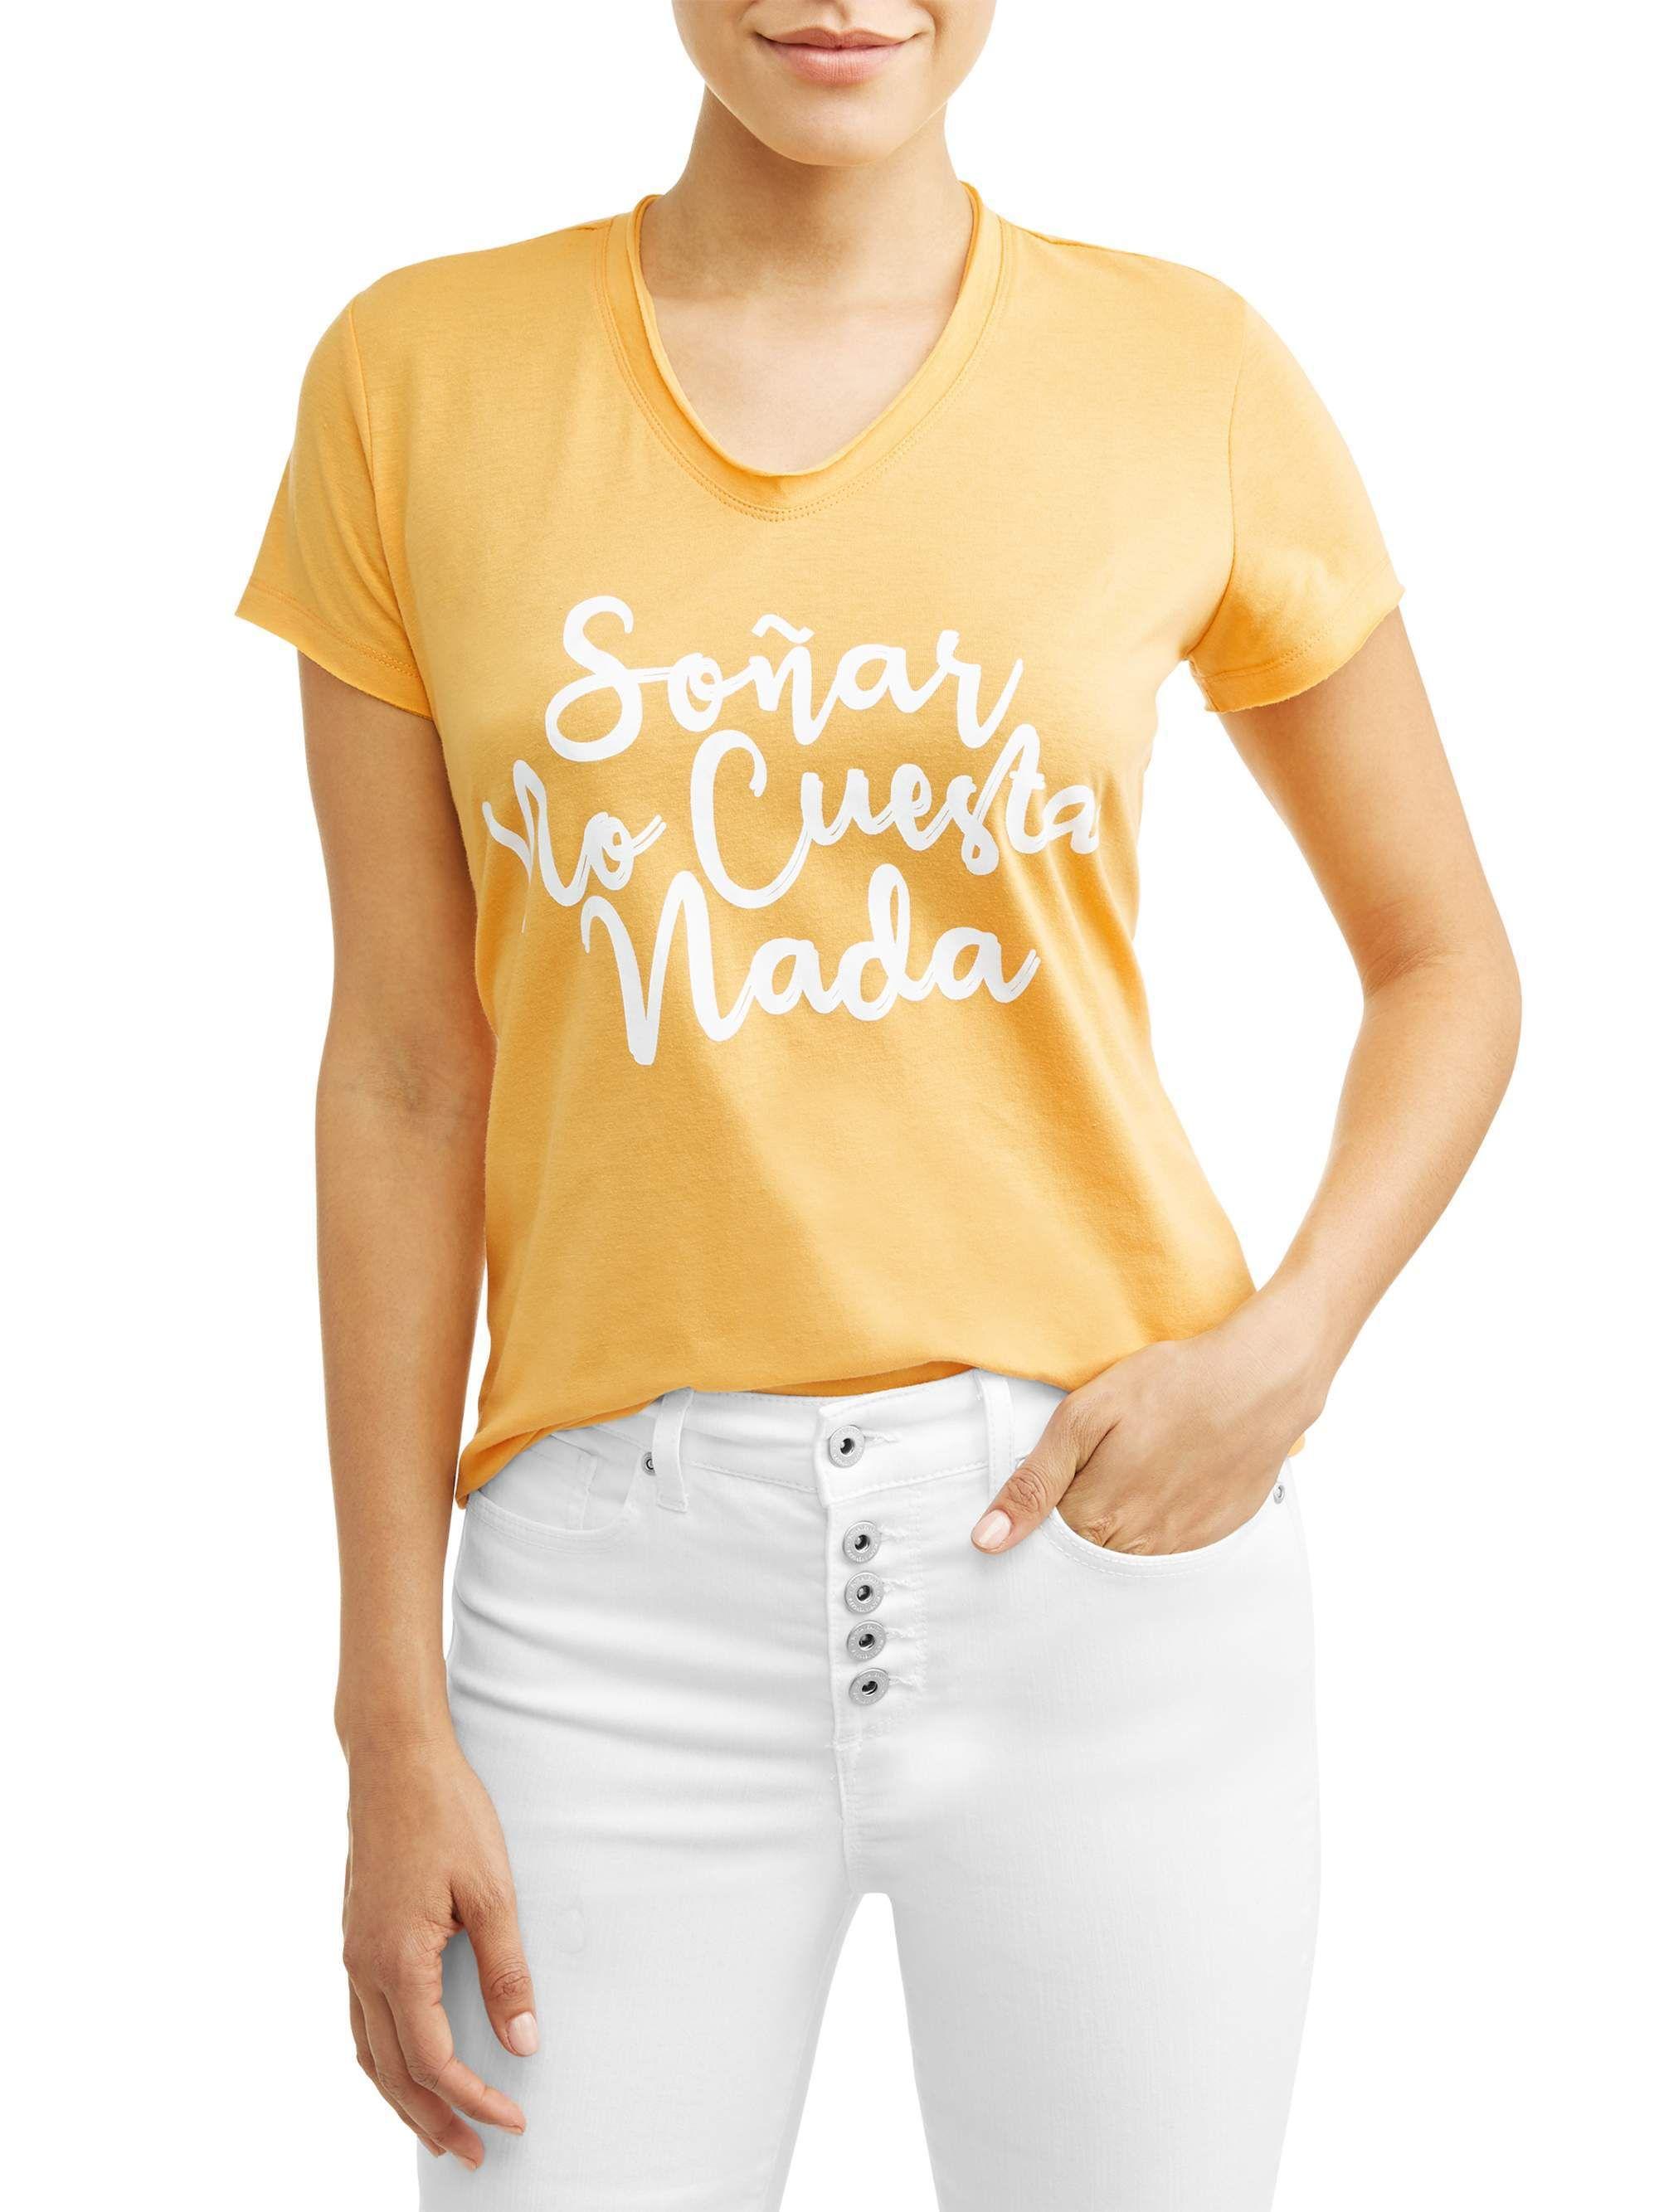 b2b287619bccd Sofia Vergara Launches Affordable Denim Clothing Line At Walmart